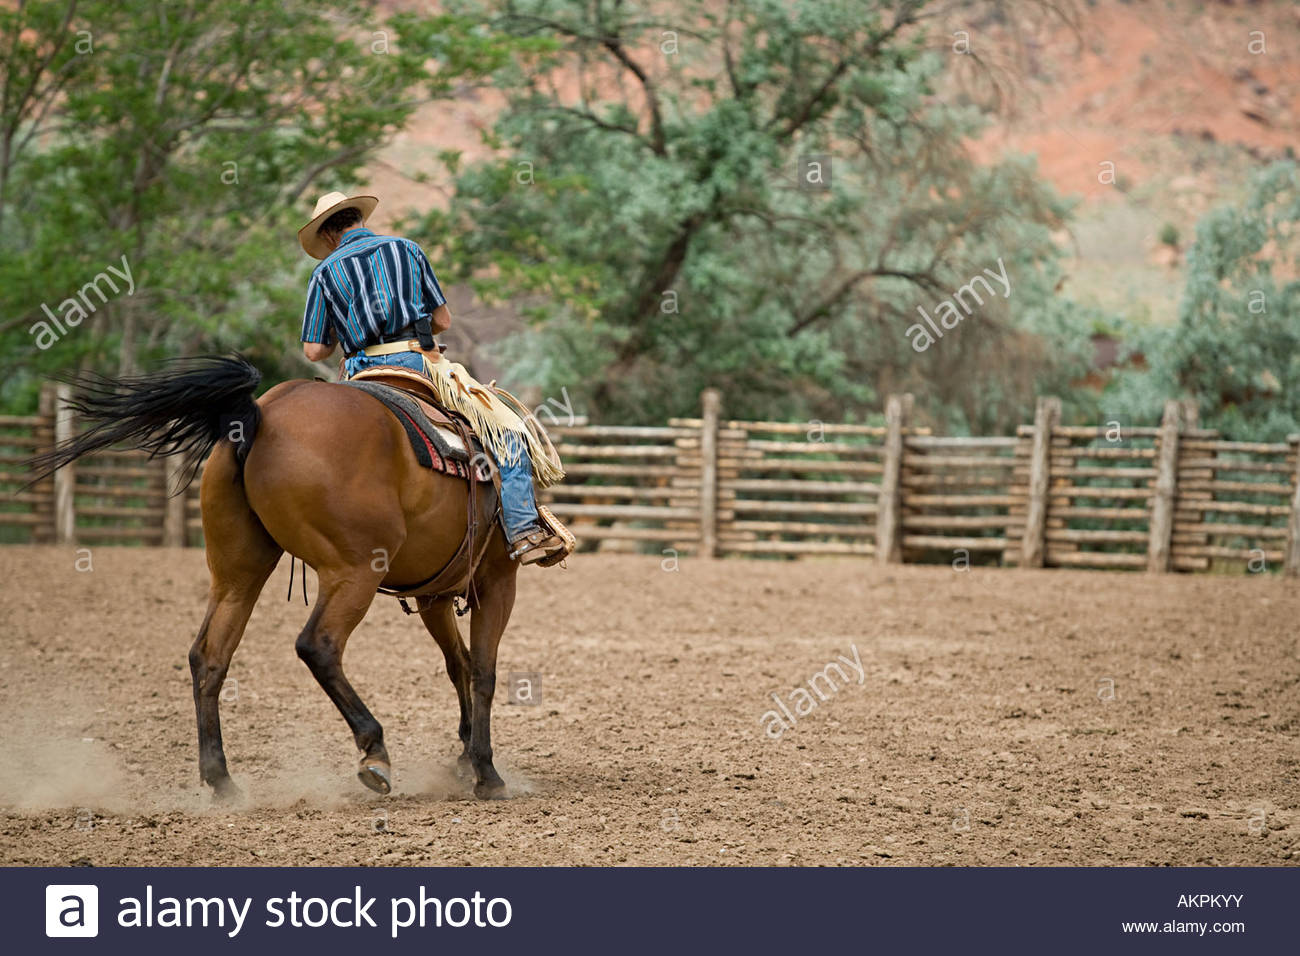 Wild West Cowboy Horse Stock Photos Wild West Cowboy Horse Stock